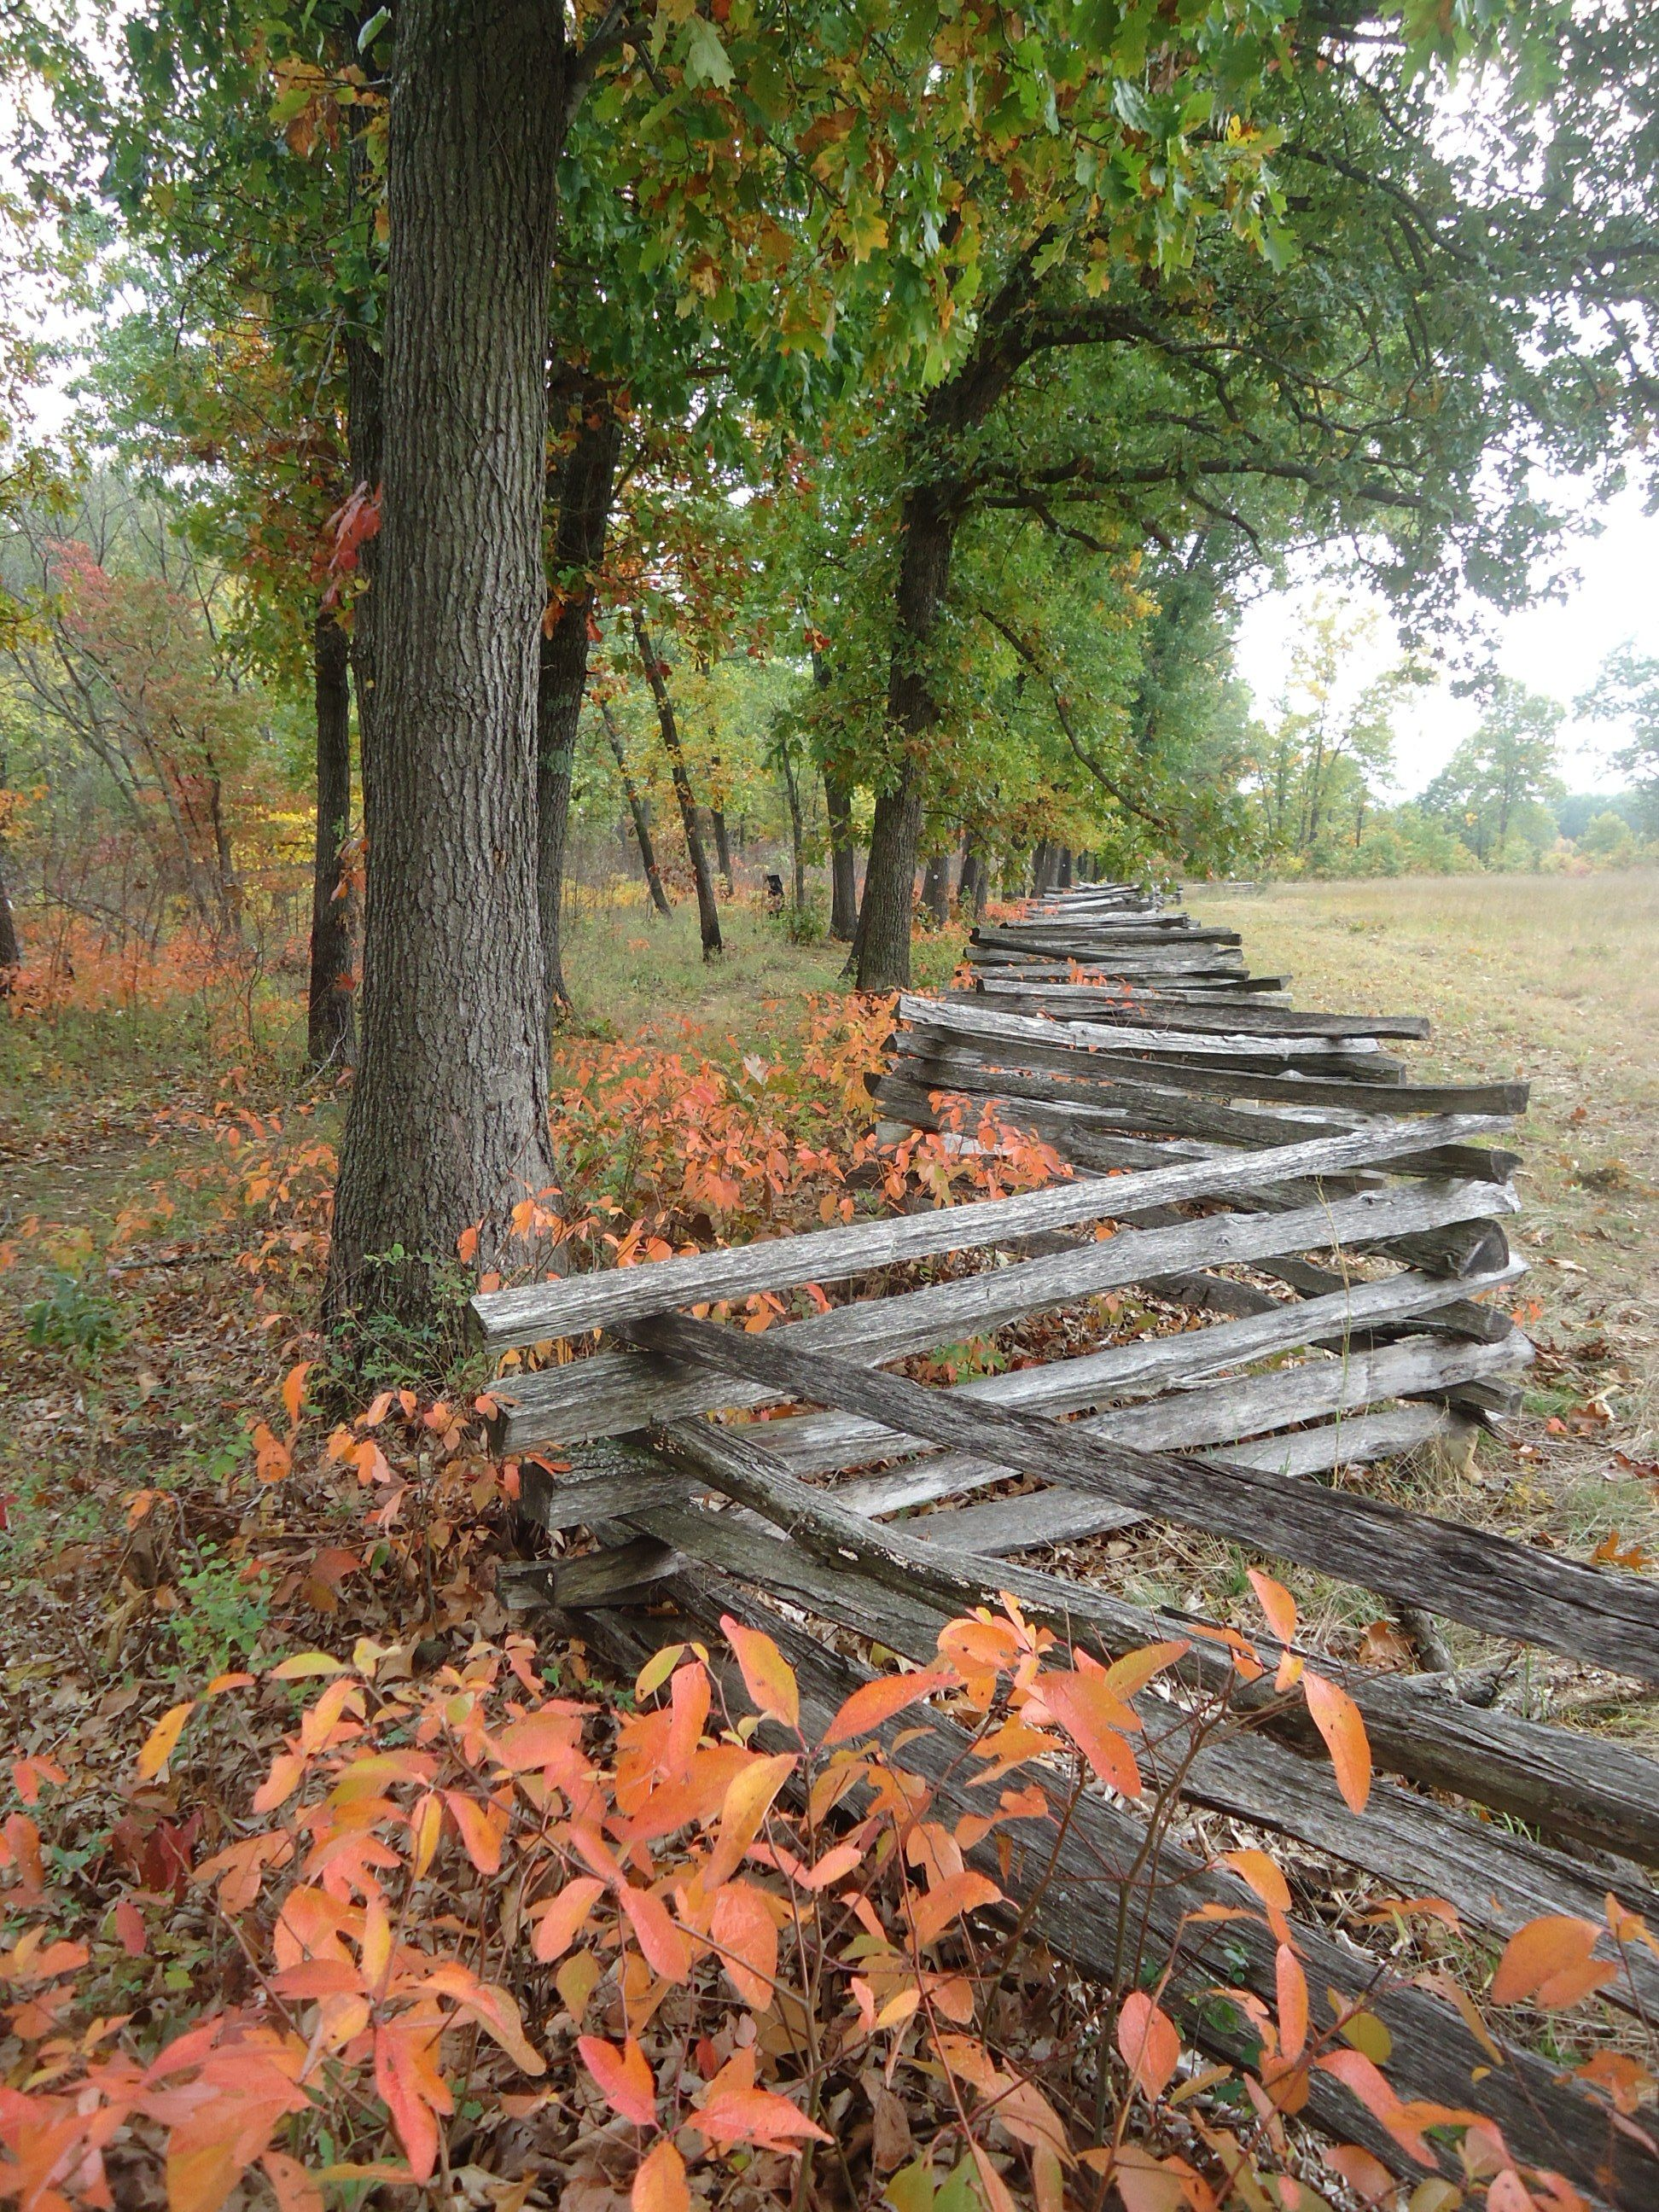 Pea Ridge National Military Park, near Rogers, Arkansas